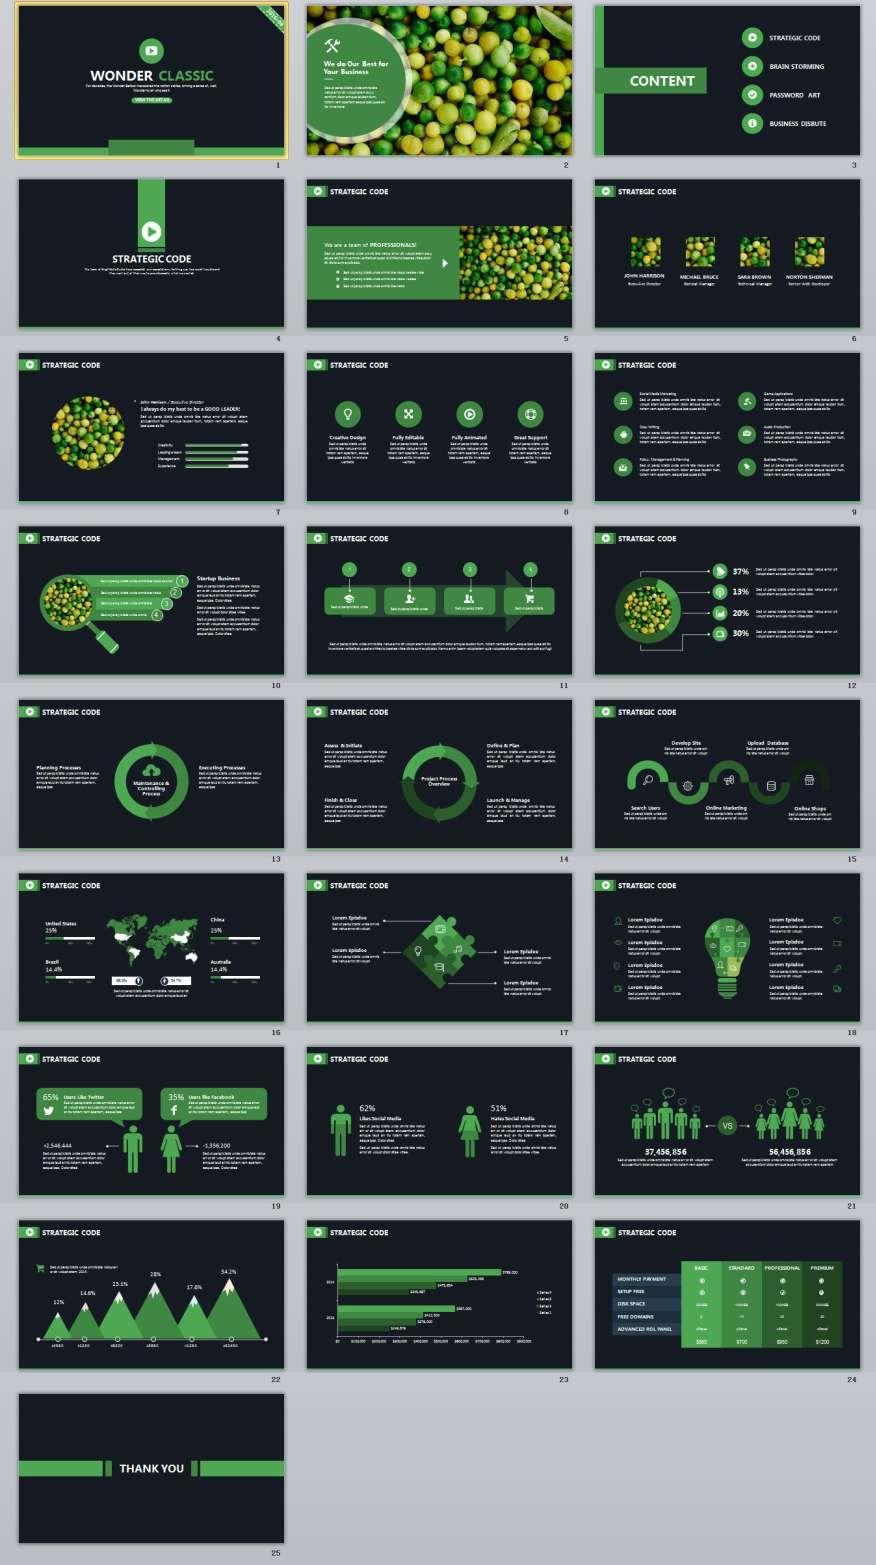 25 green design powerpoint template powerpoint templates 25 green design powerpoint template create powerpoint toneelgroepblik Choice Image